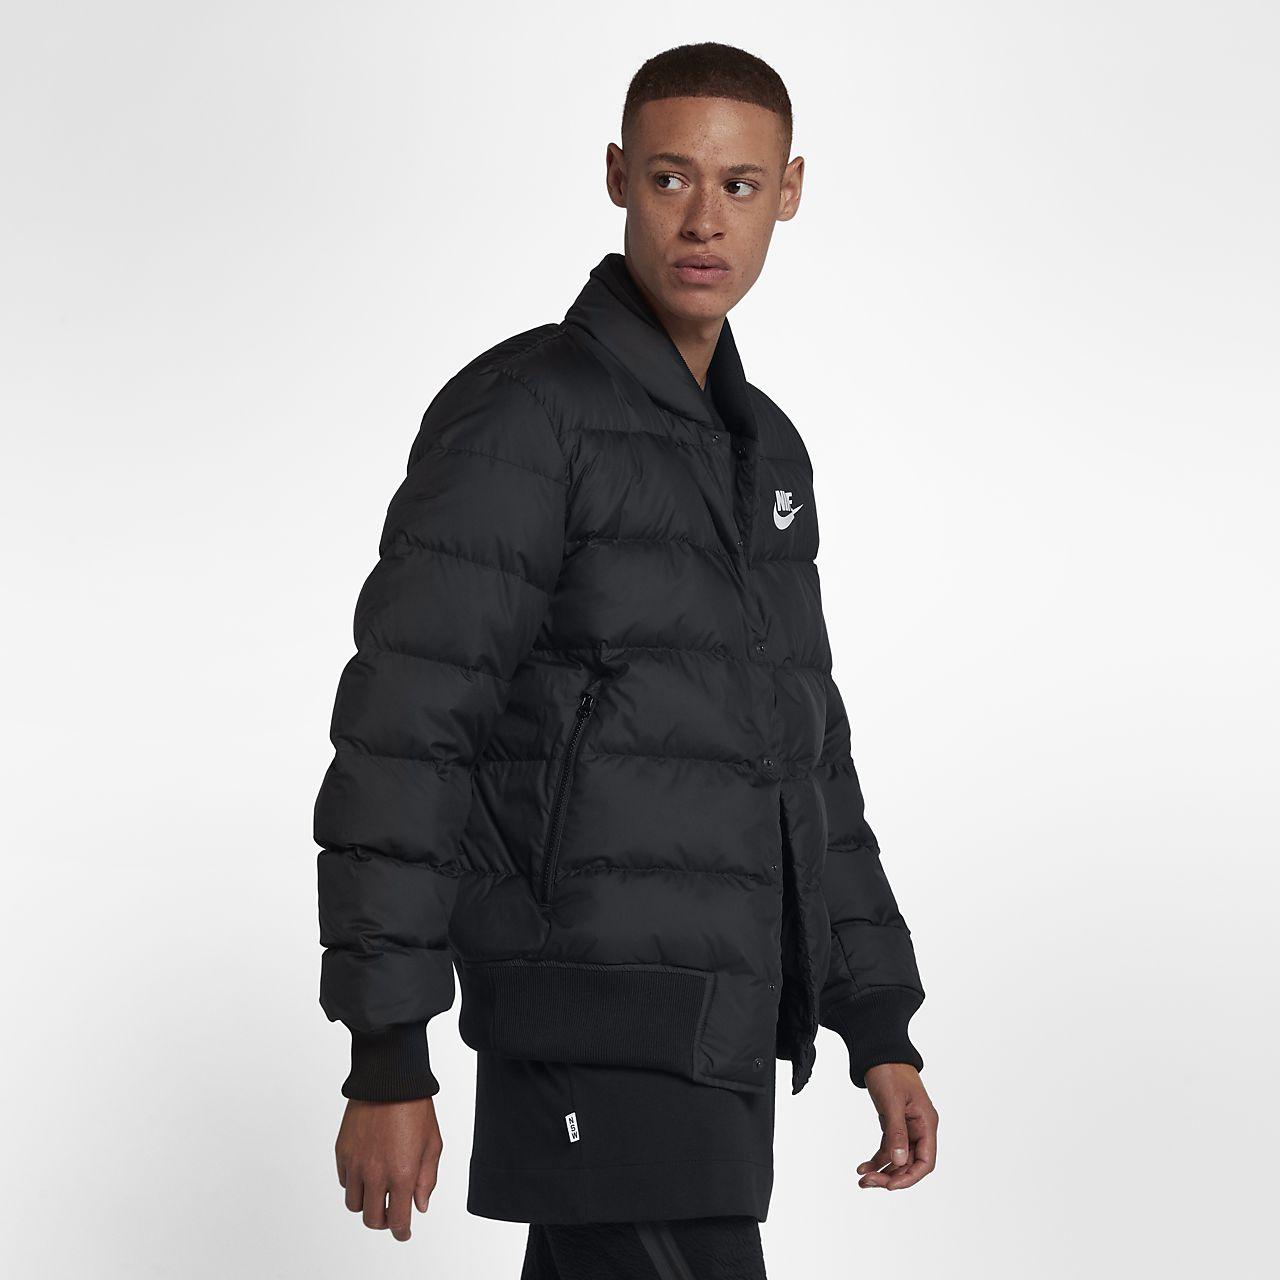 8868f72ab3a5 Nike Sportswear Down Fill Men s Bomber Jacket. Nike.com AU